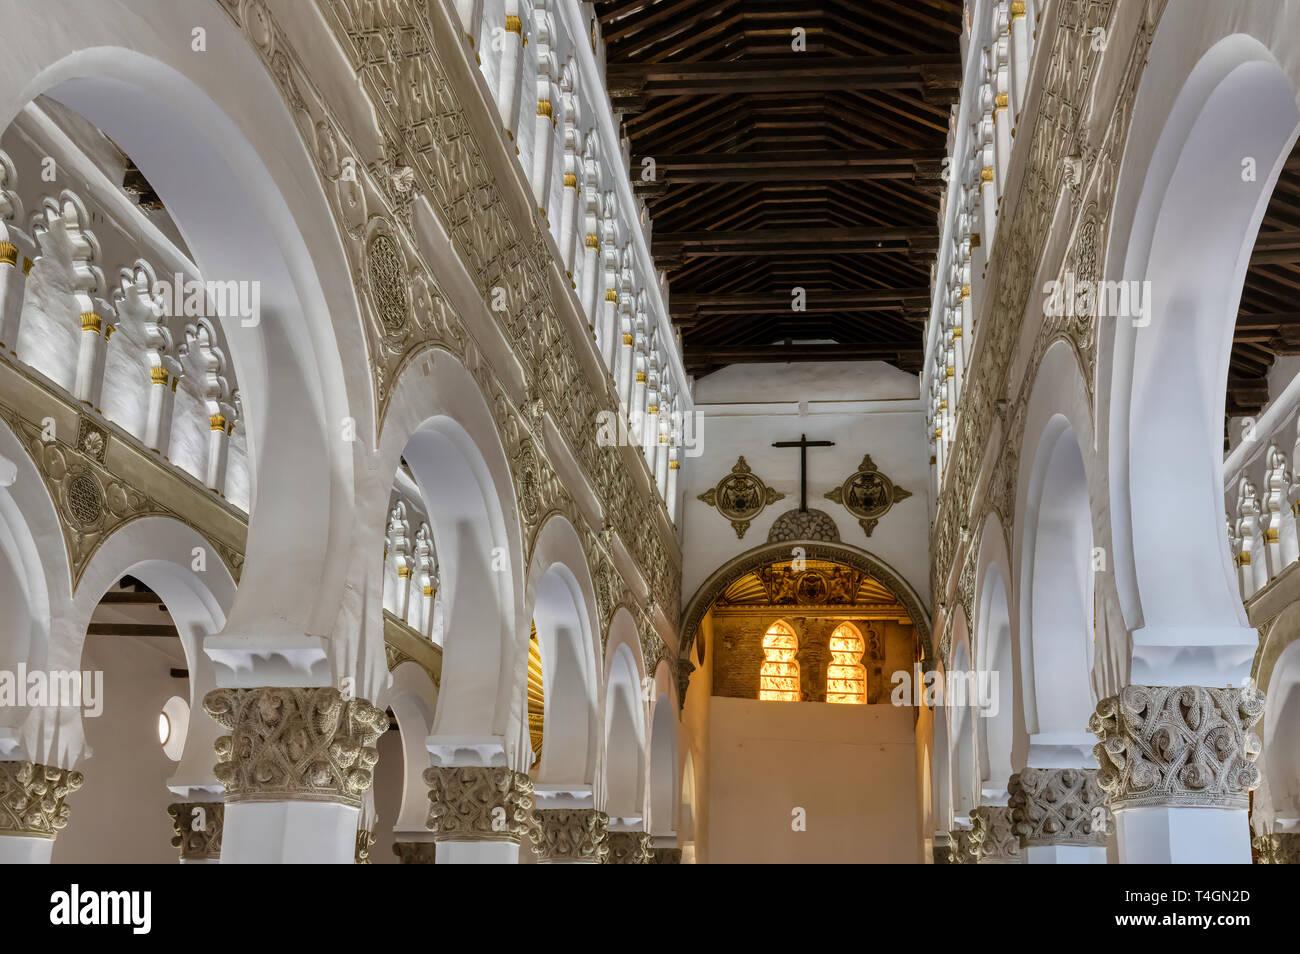 TOLEDO, SPAIN - MARCH 23,2019: White arches at Ancient Sinagoga de Santa Maria La Blanca (Synagogue) in the historical center of Toledo, Spain Stock Photo